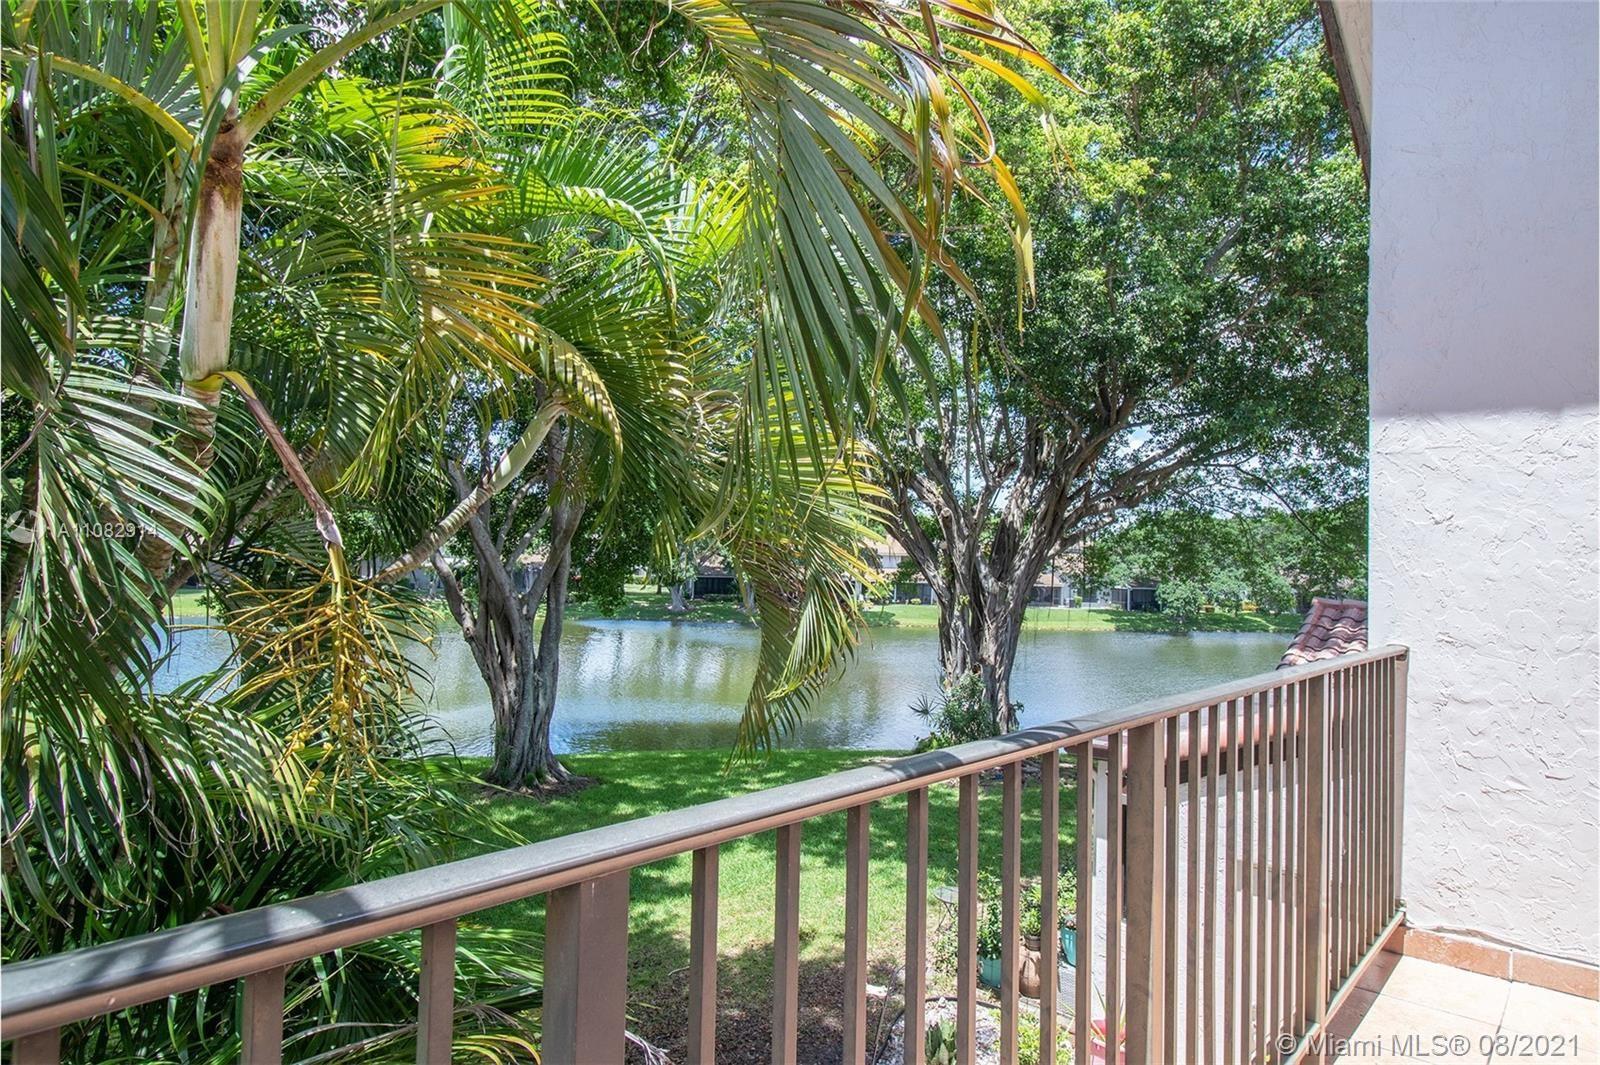 651 Deer Creek Lake Point North Ln, Deerfield Beach, FL 33442 - #: A11082914